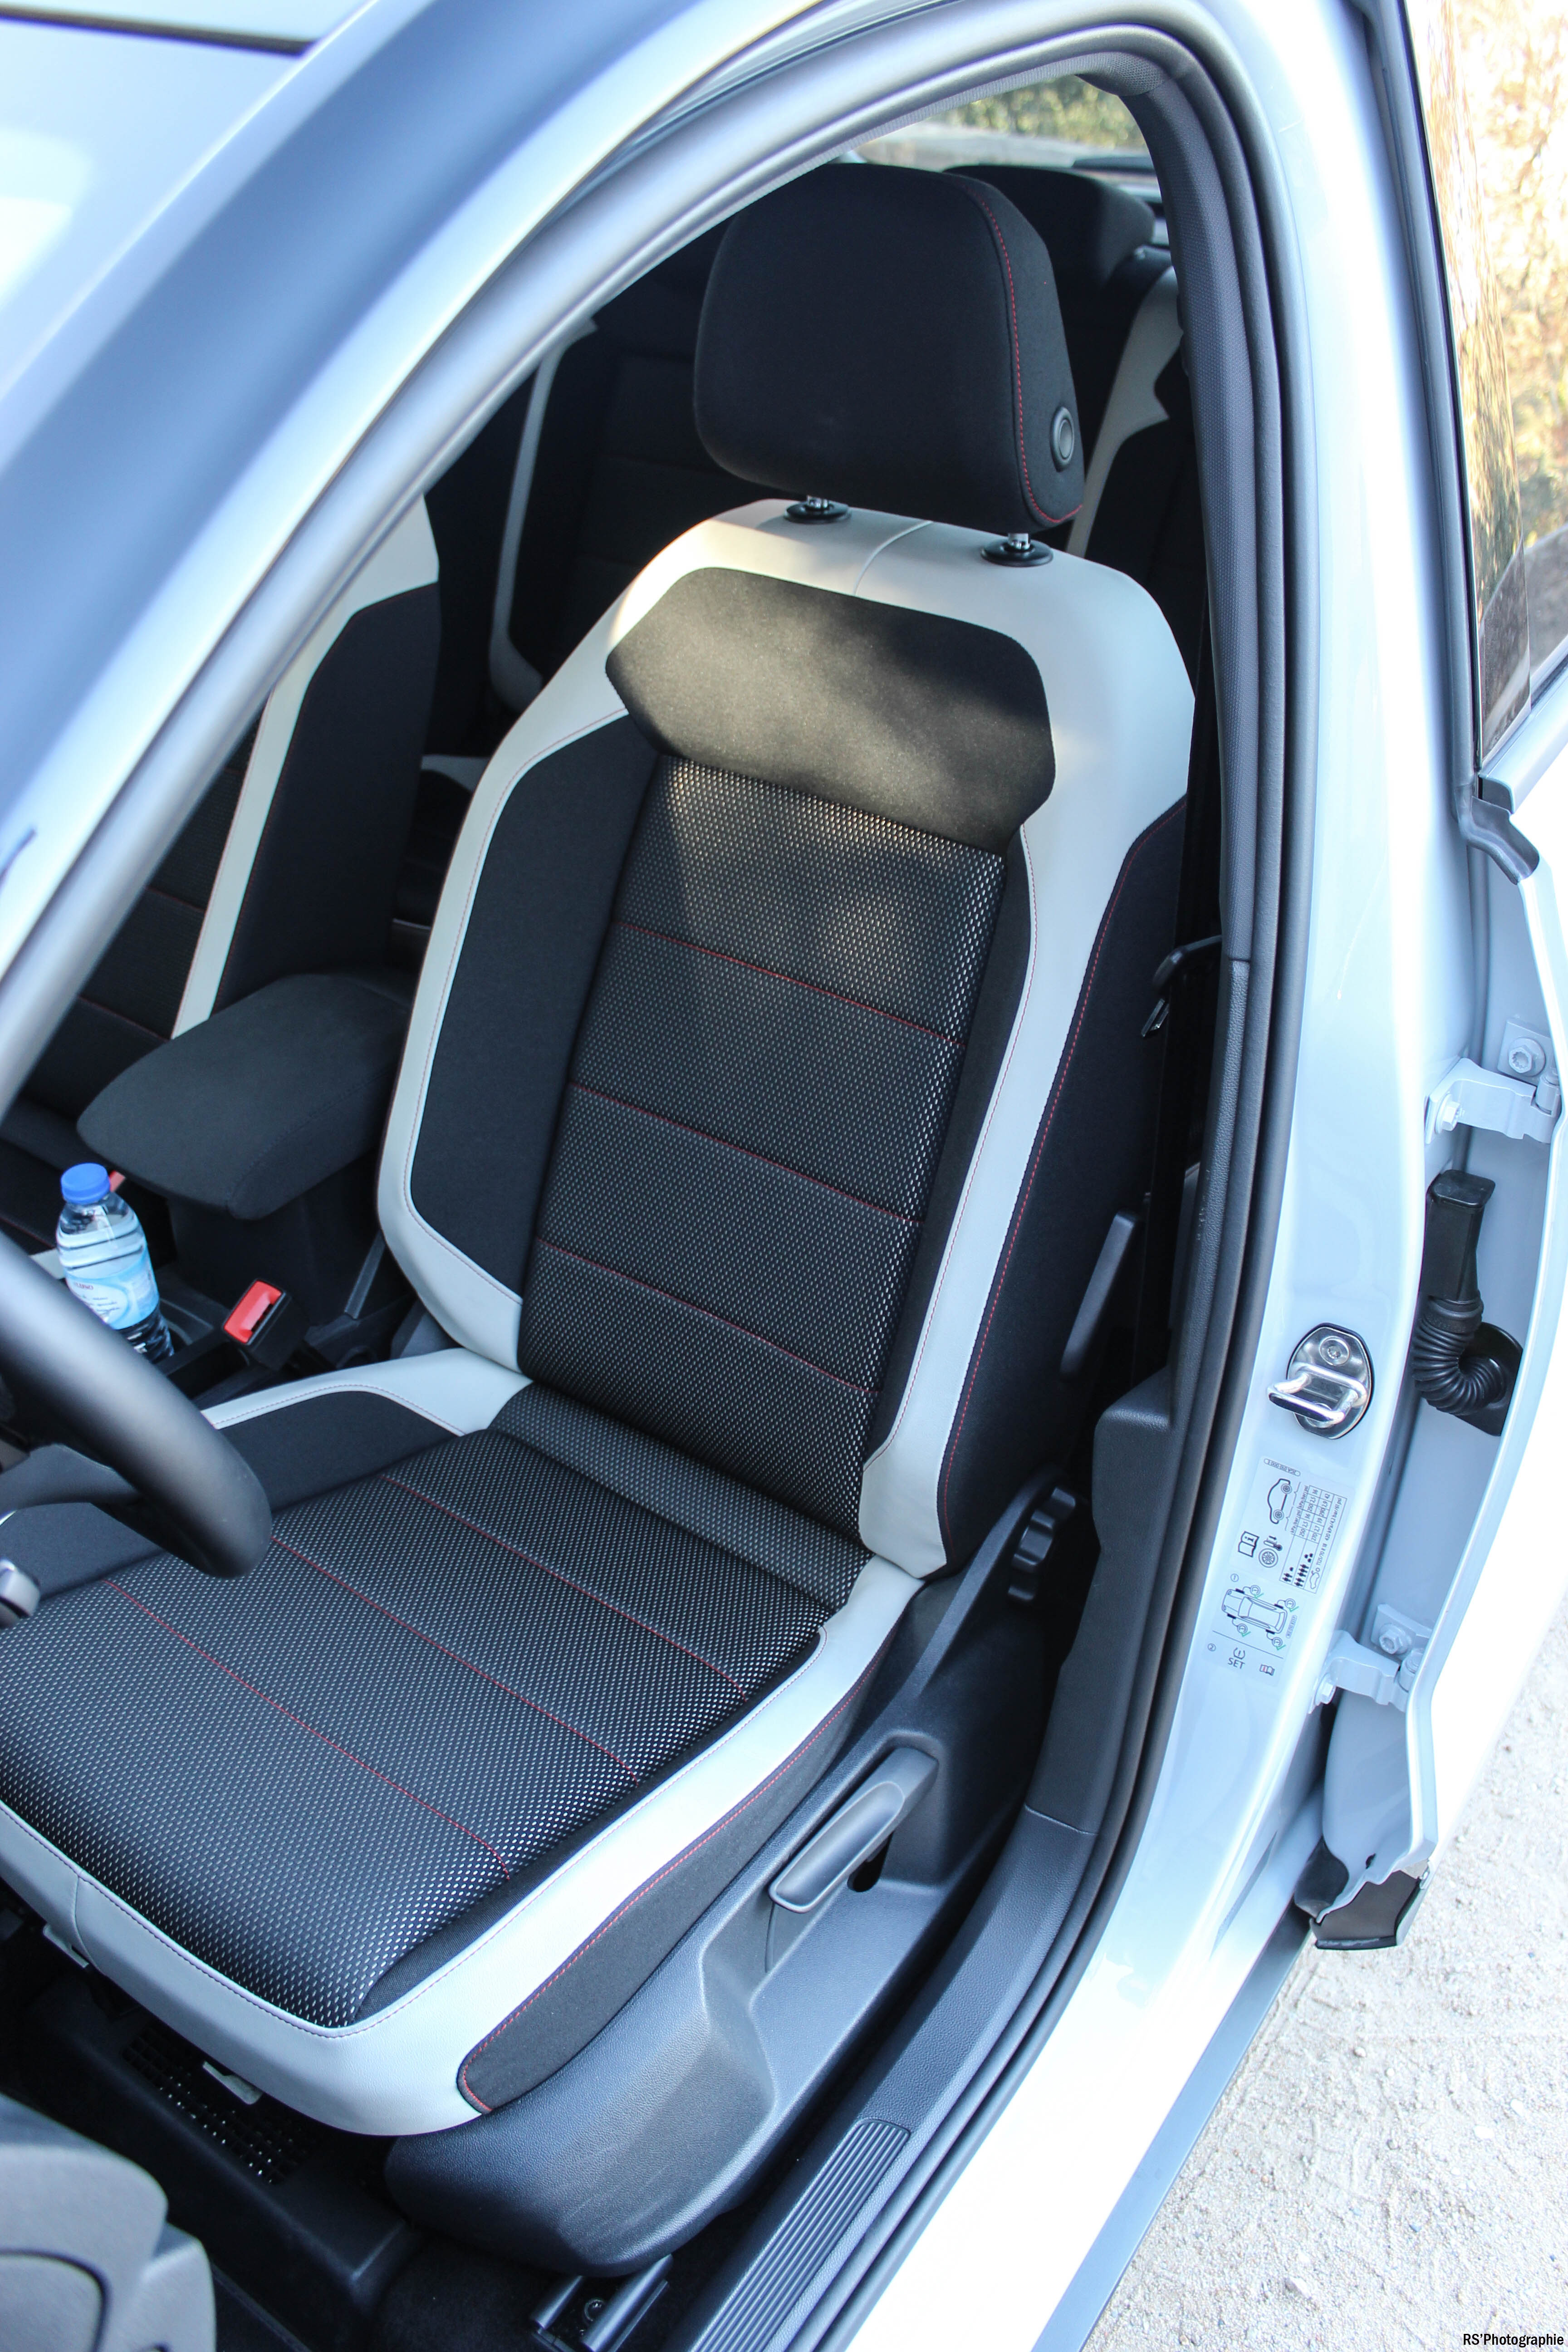 Volkswagentroc31-vw-t-roc-intérieur-onboard-Arnaud Demasier-RSPhotographie